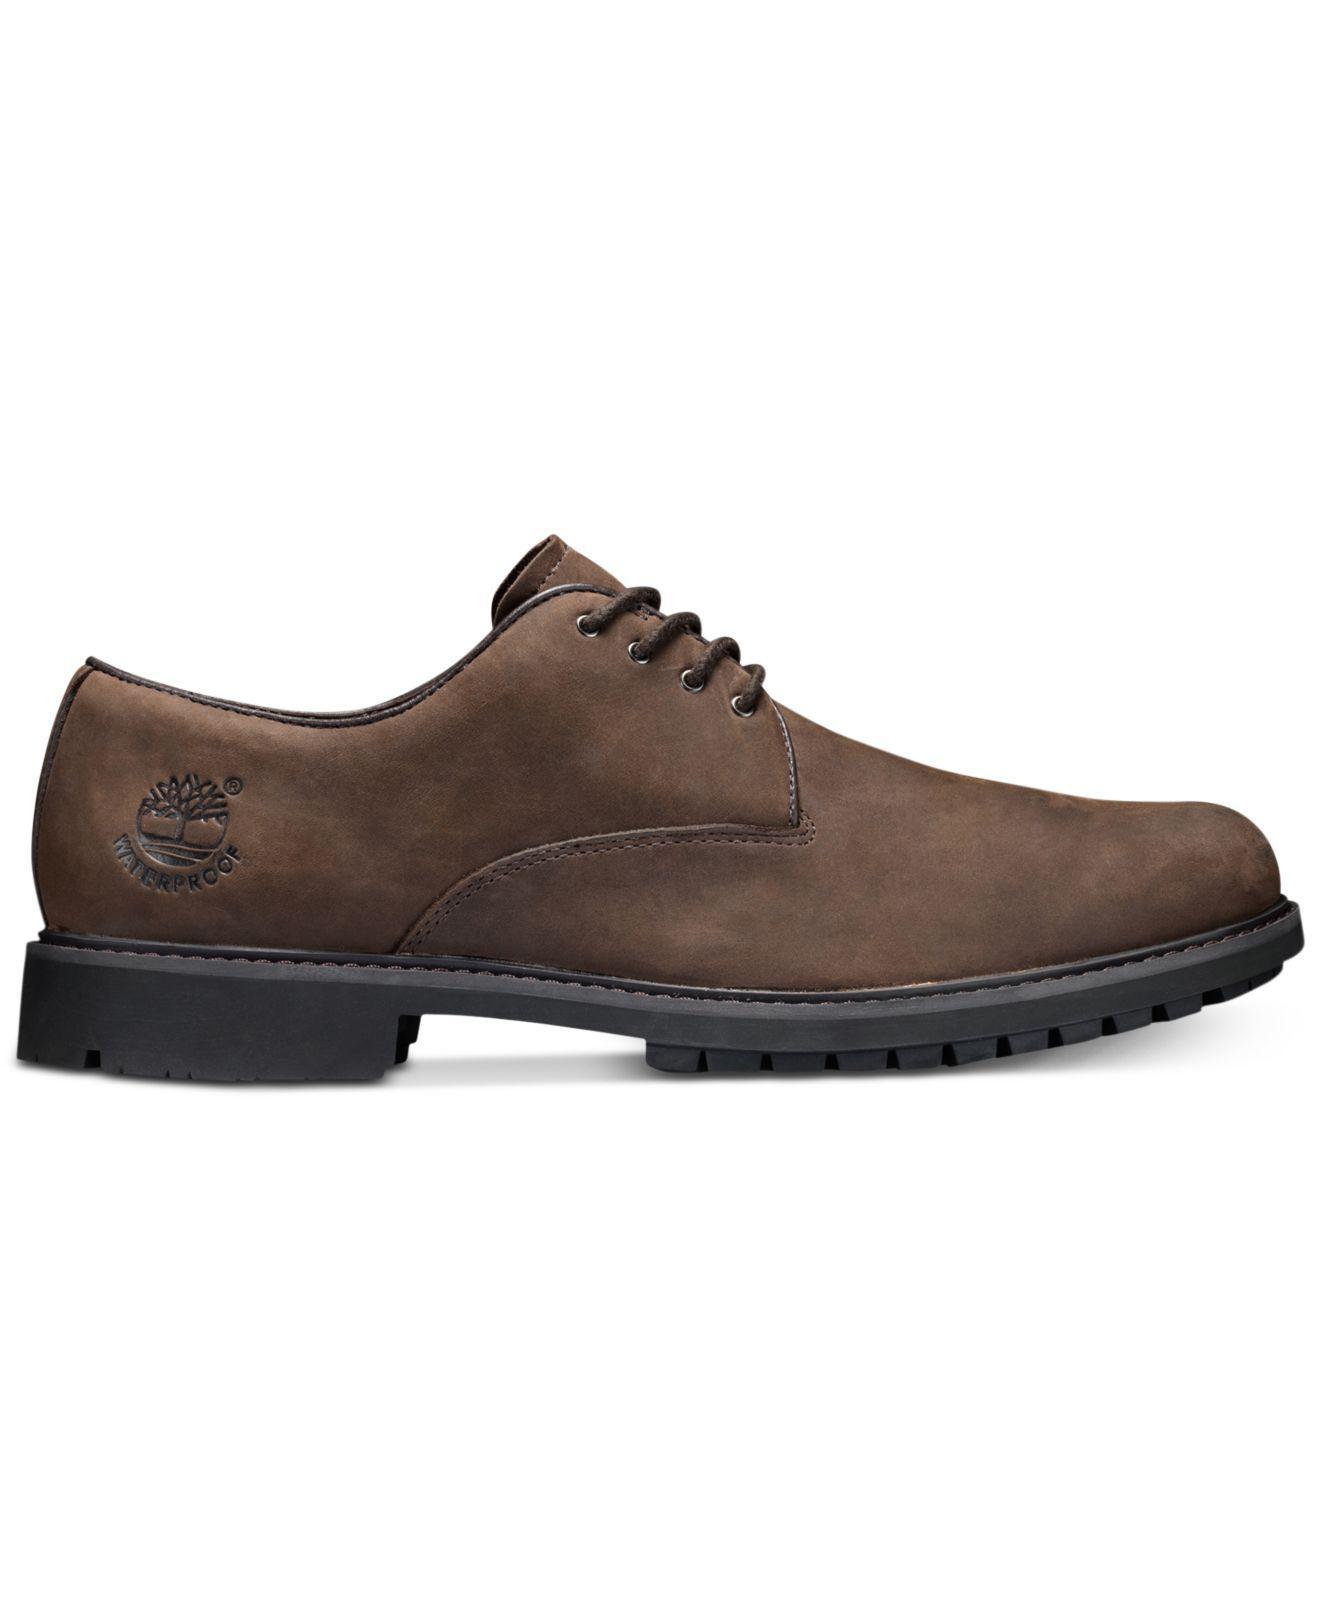 eddaebcc62da9 Lyst - Timberland Men's Stormbuck Pto Shoes in Brown for Men